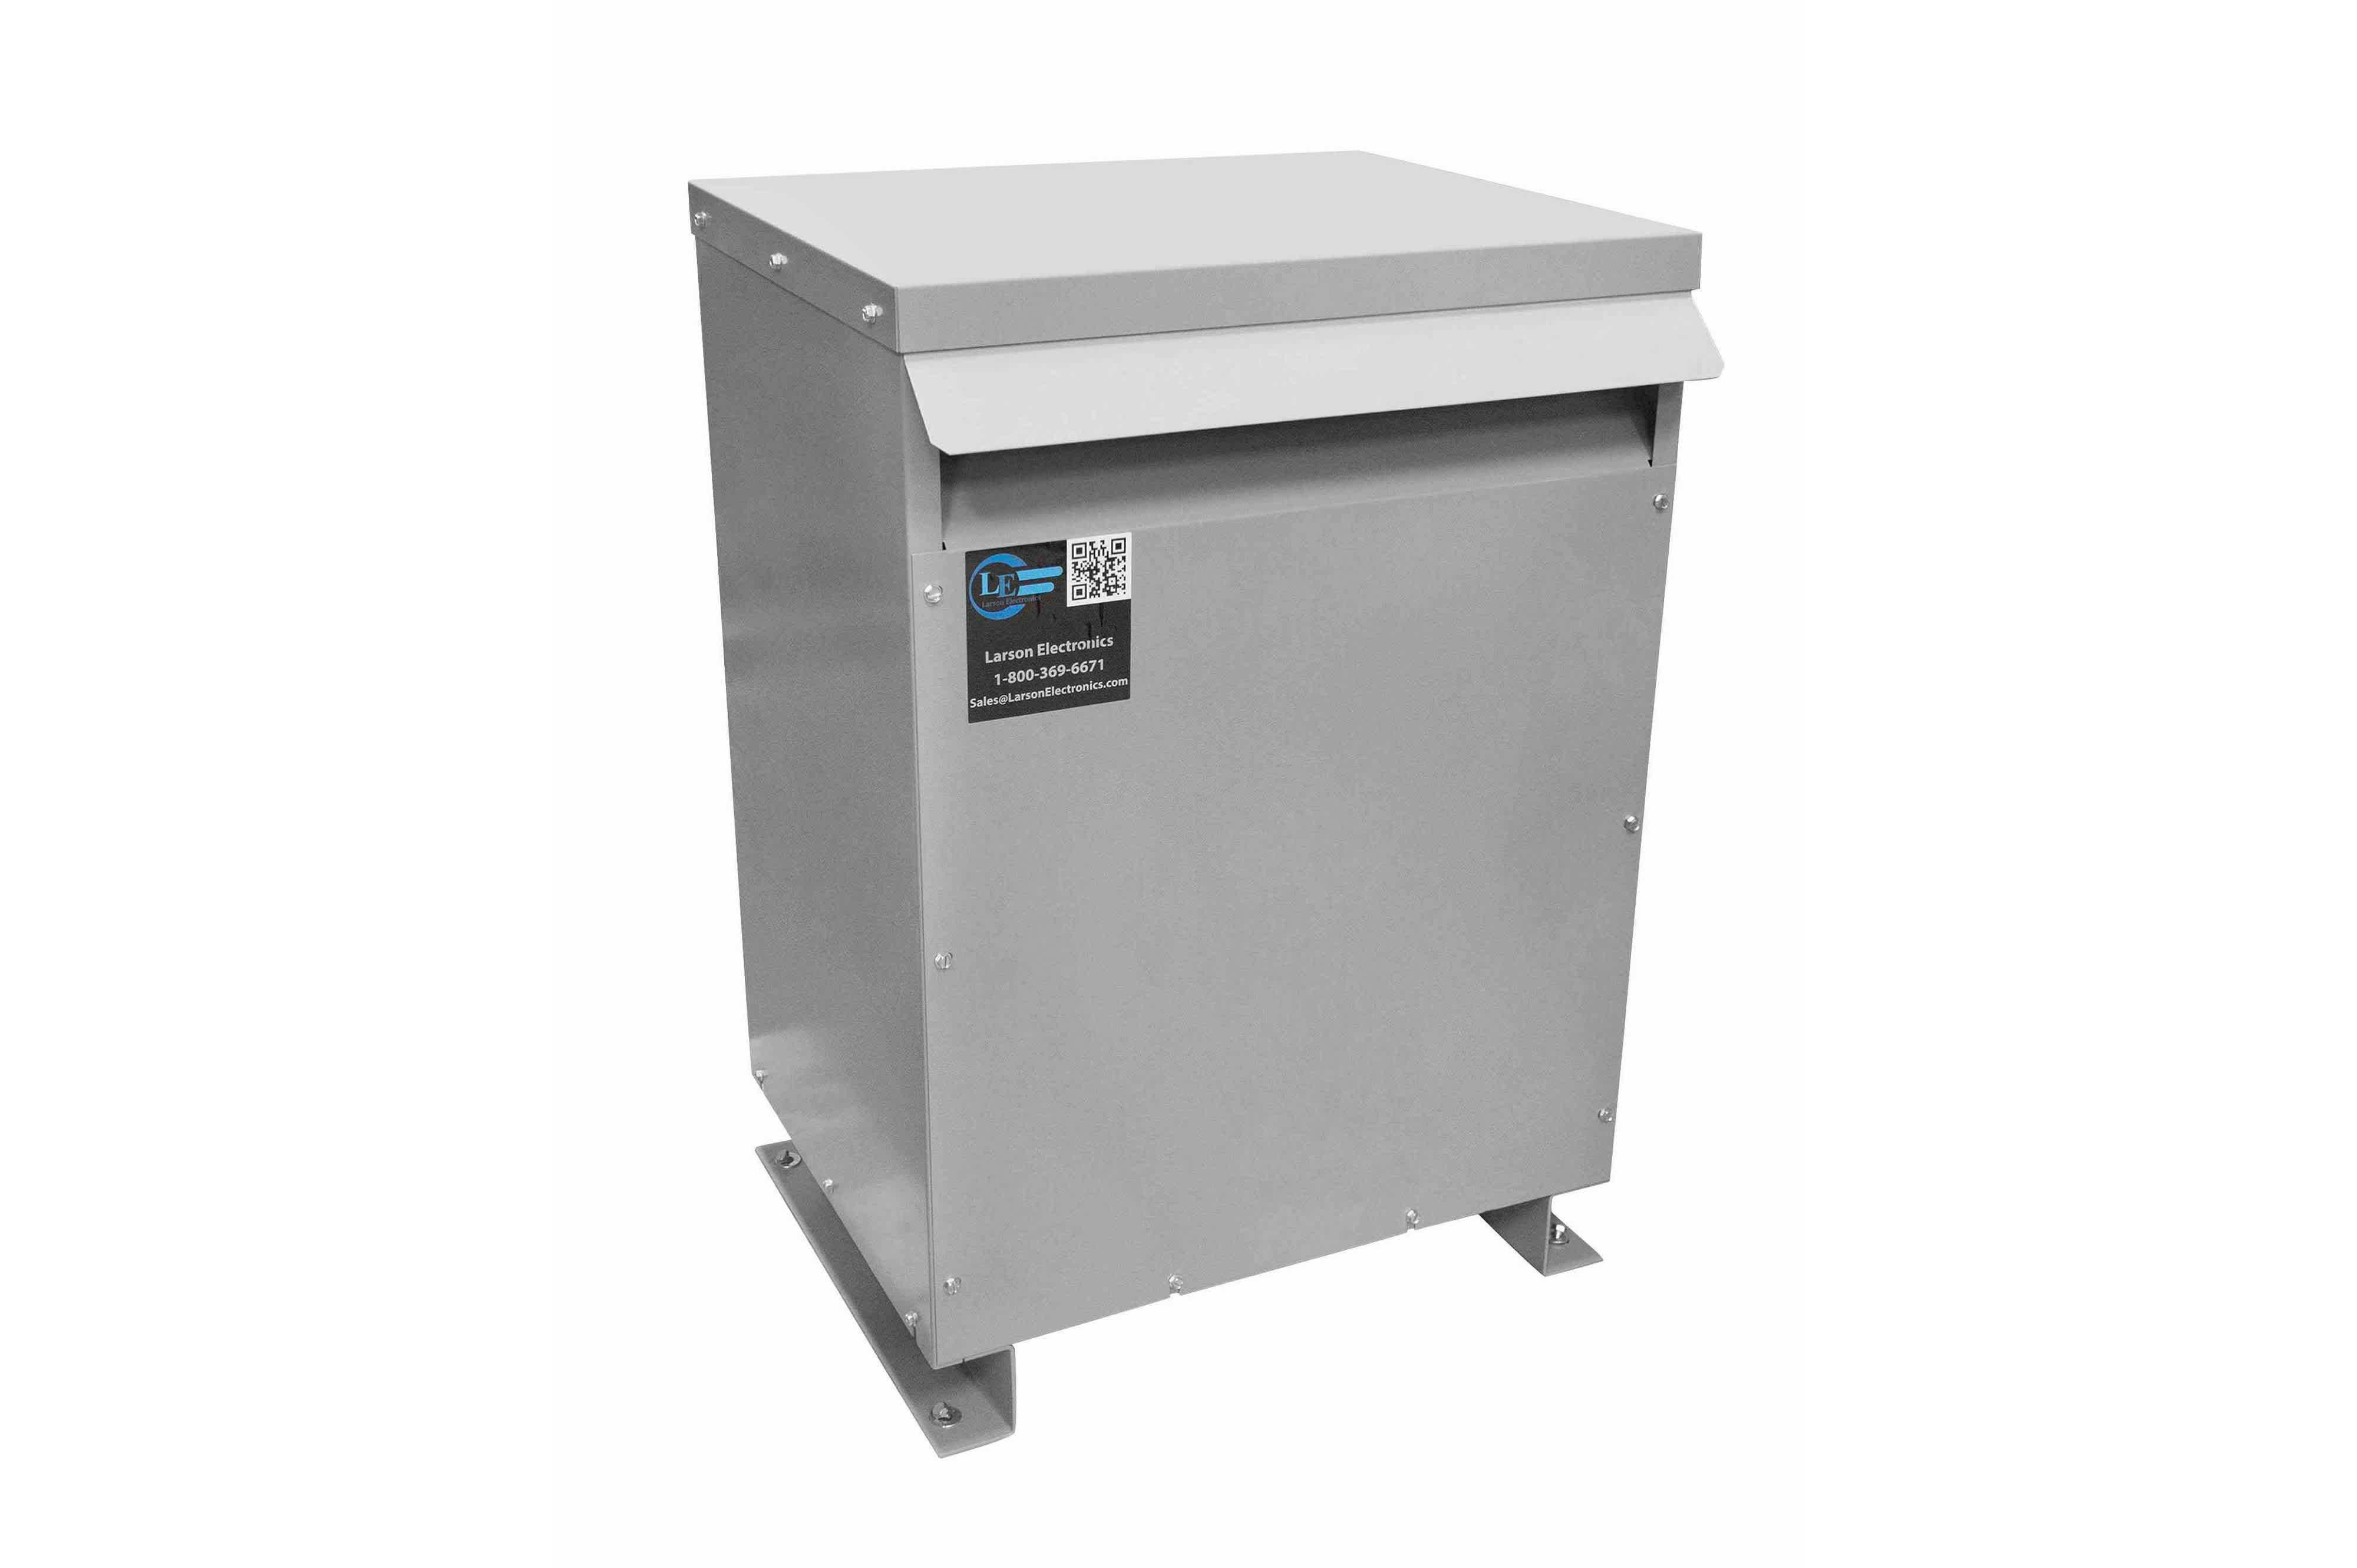 112.5 kVA 3PH Isolation Transformer, 240V Wye Primary, 400V Delta Secondary, N3R, Ventilated, 60 Hz